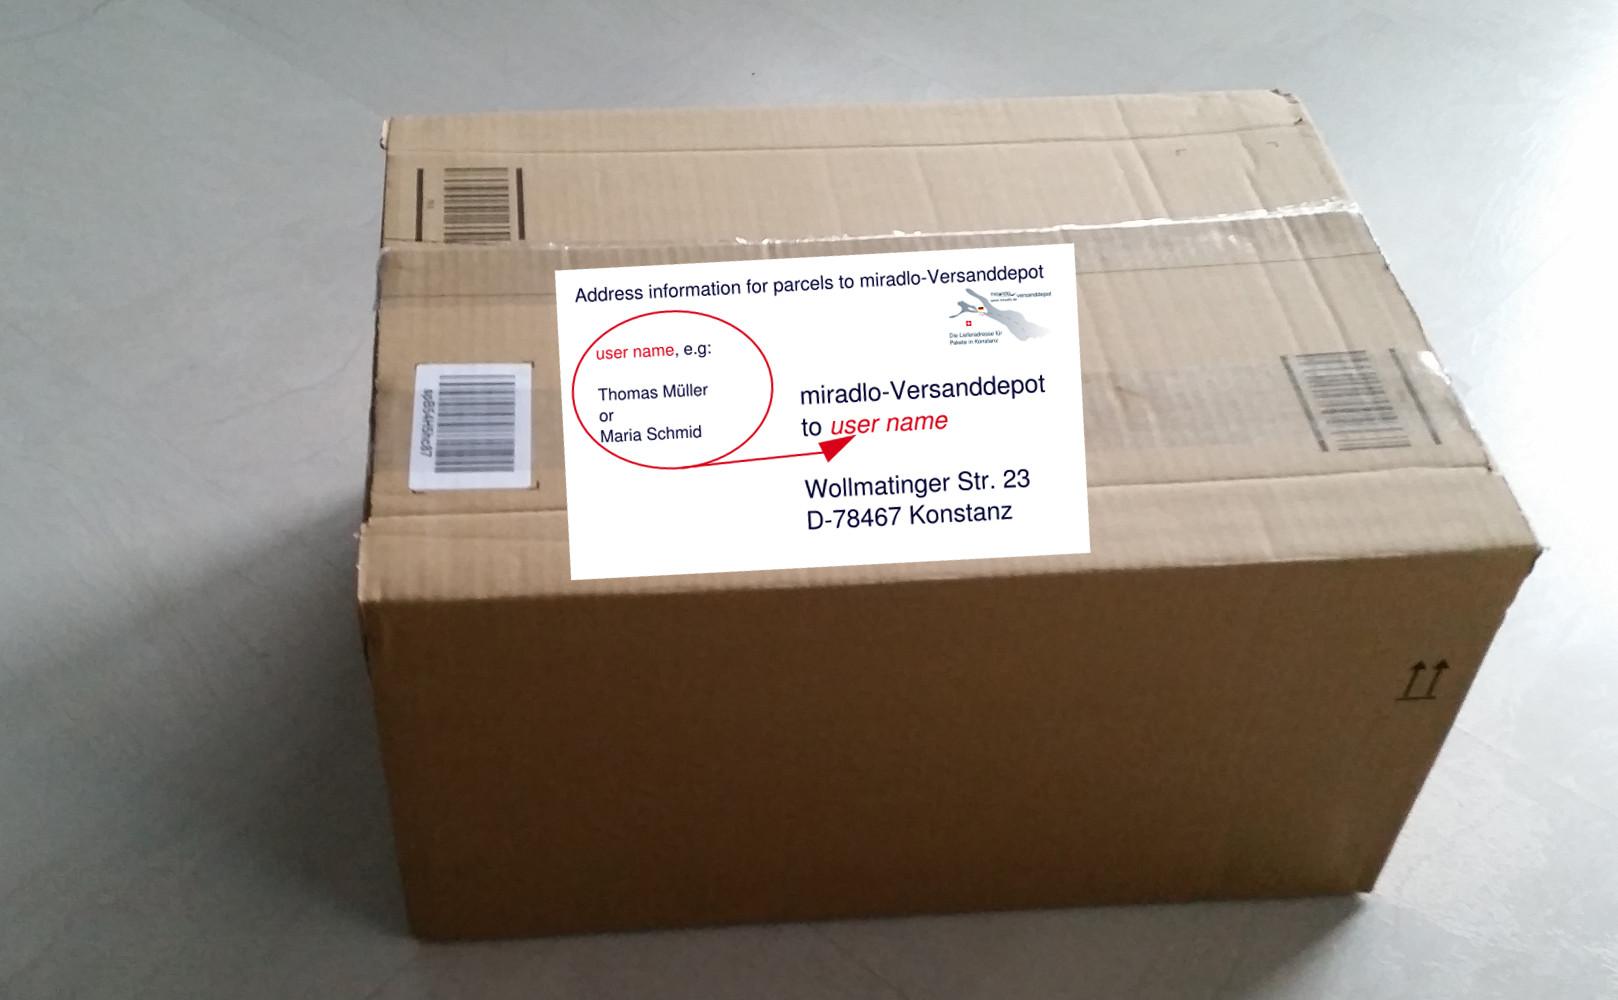 parcel address info for shipping to German delivery address miradlo-Versanddepot, Konstanz